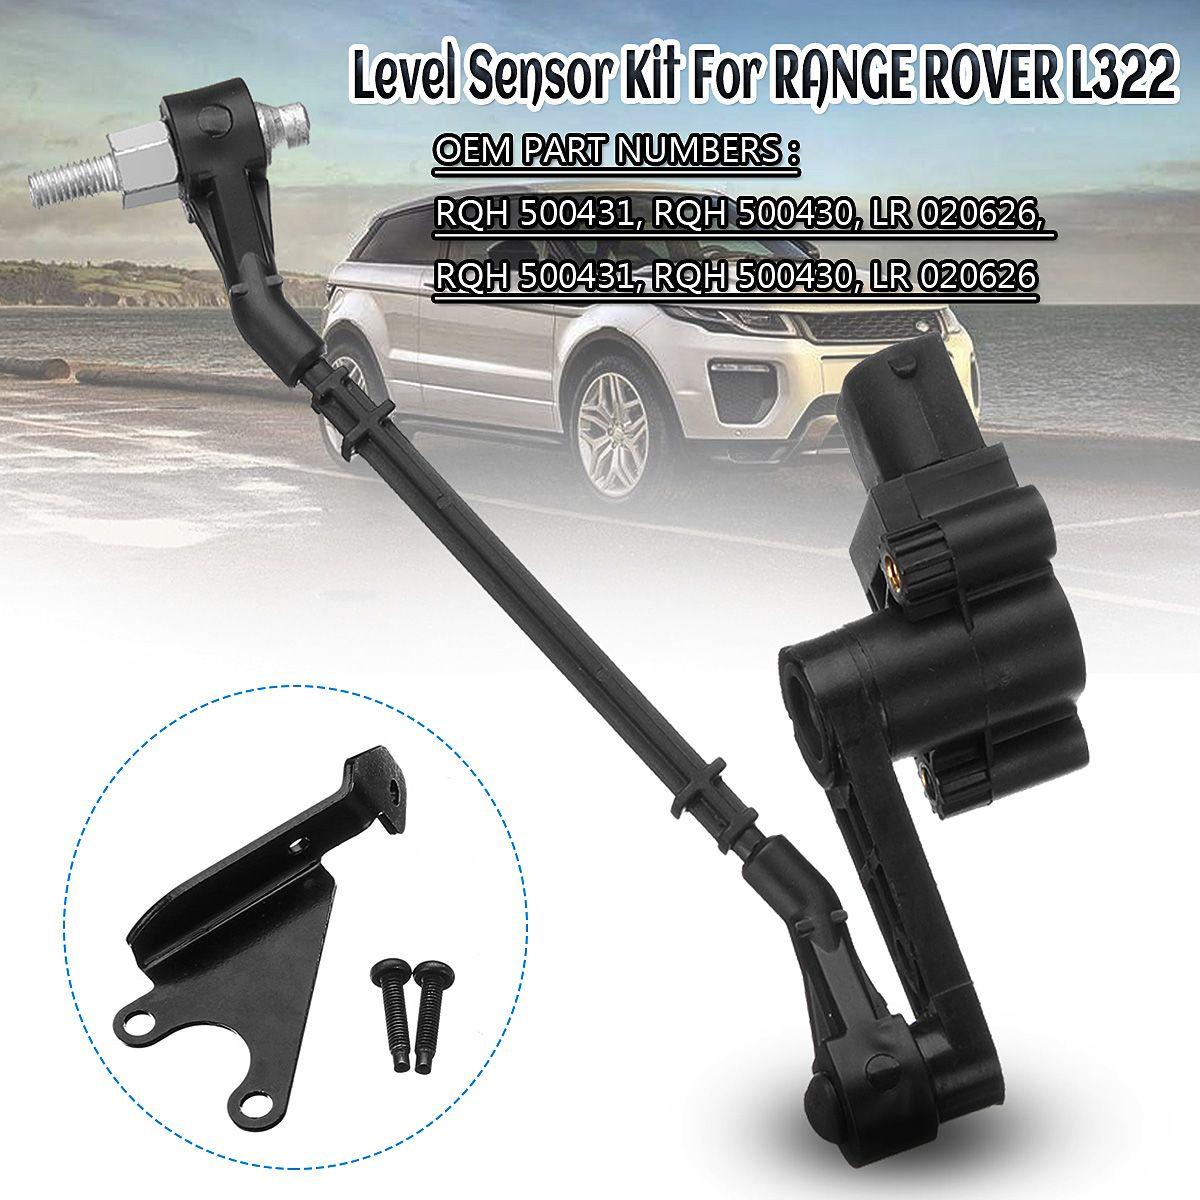 Vorne Rechts Vorne Links Luftfederung Höhe Level Sensor LR020626 Für Range Rover L322 RQH500421 RQH500420 RQH500431 RQH500430